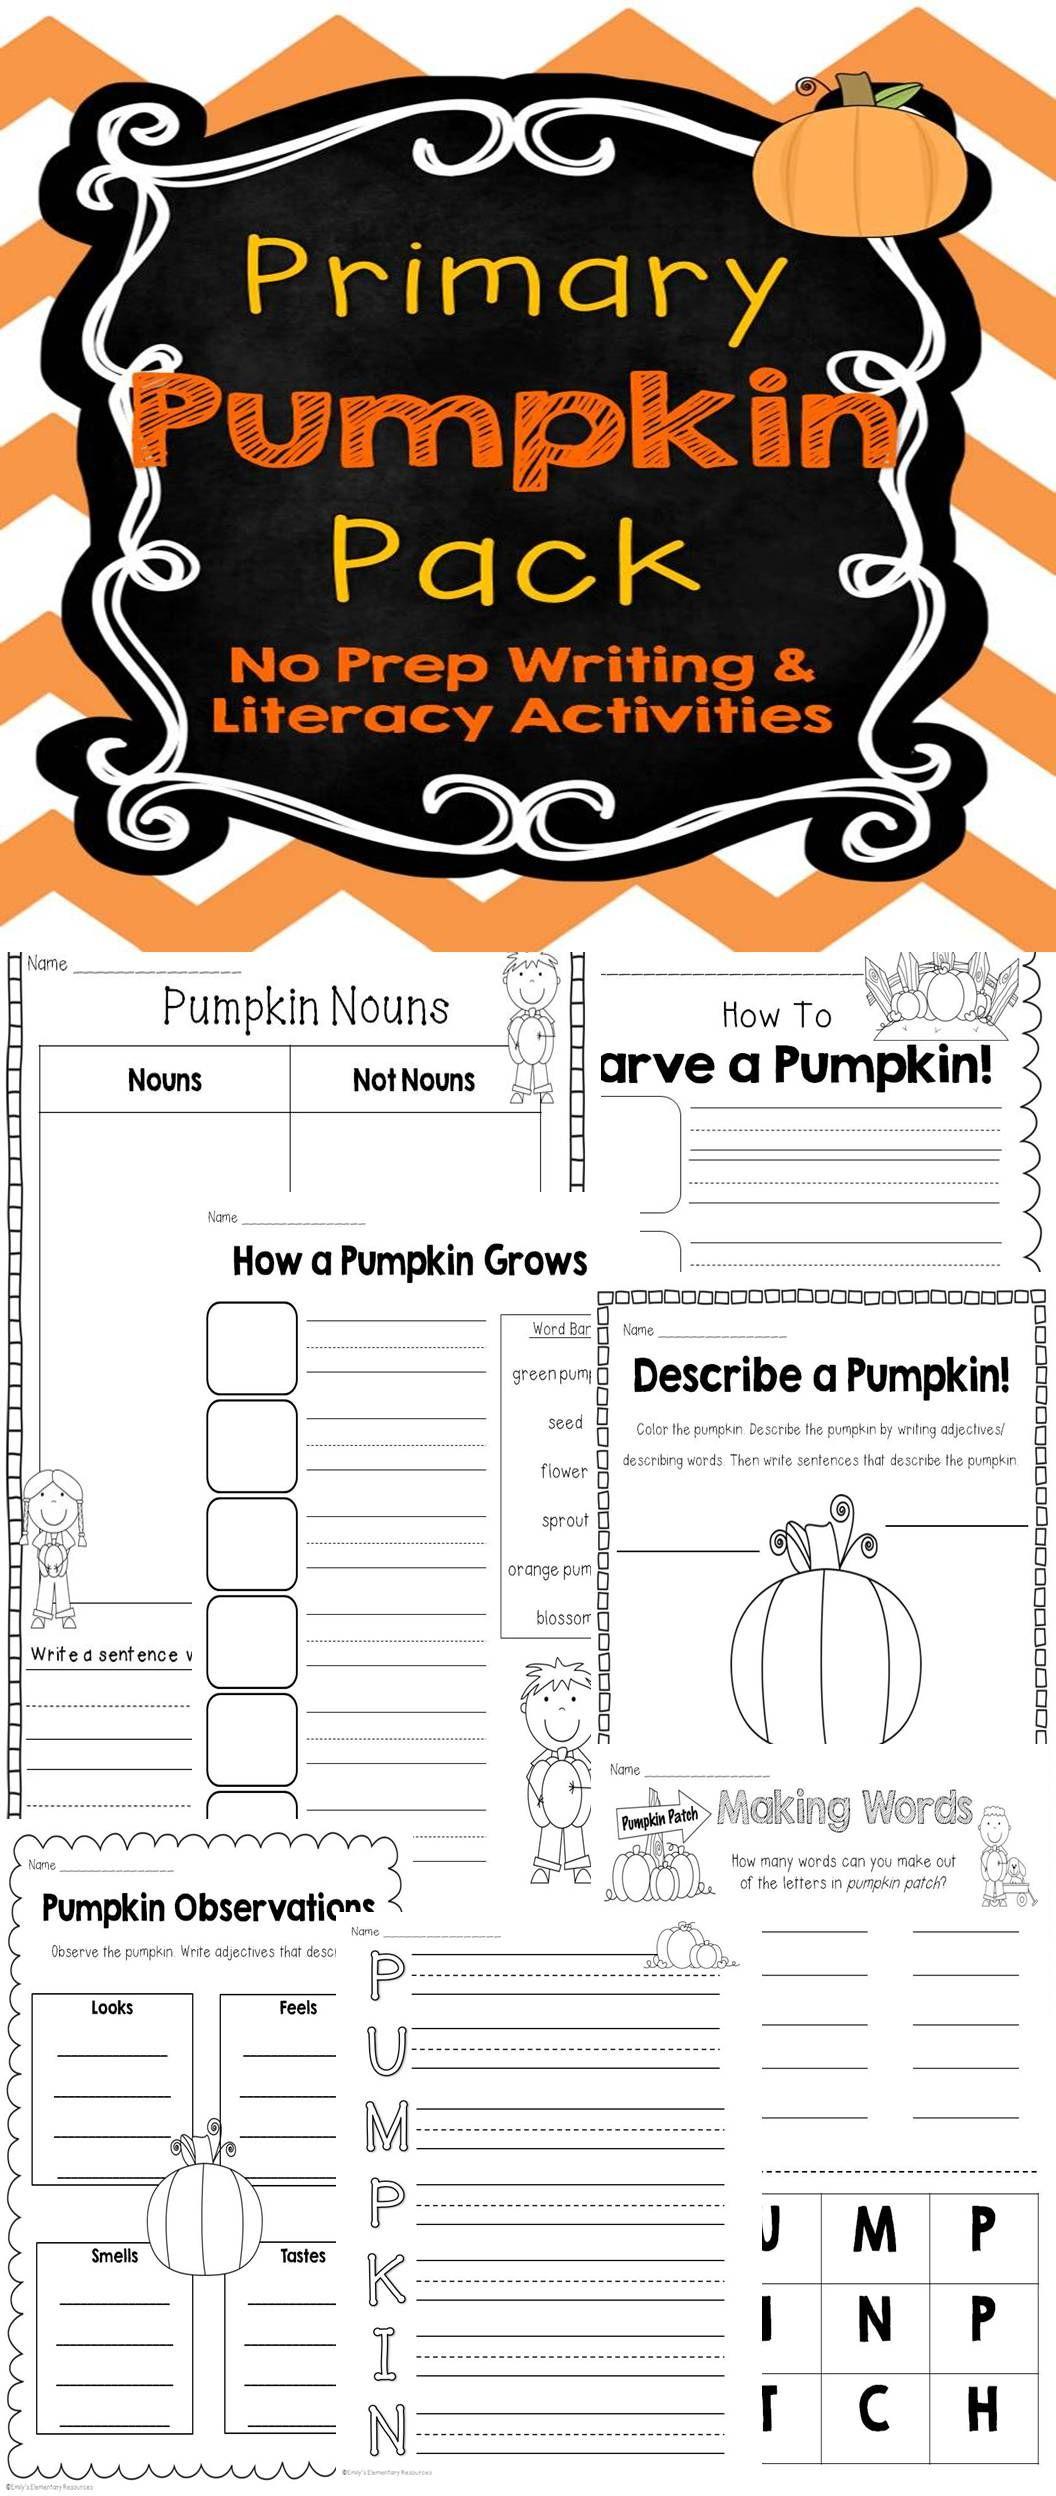 Primary Pumpkin Pack No Prep Writing Amp Literacy